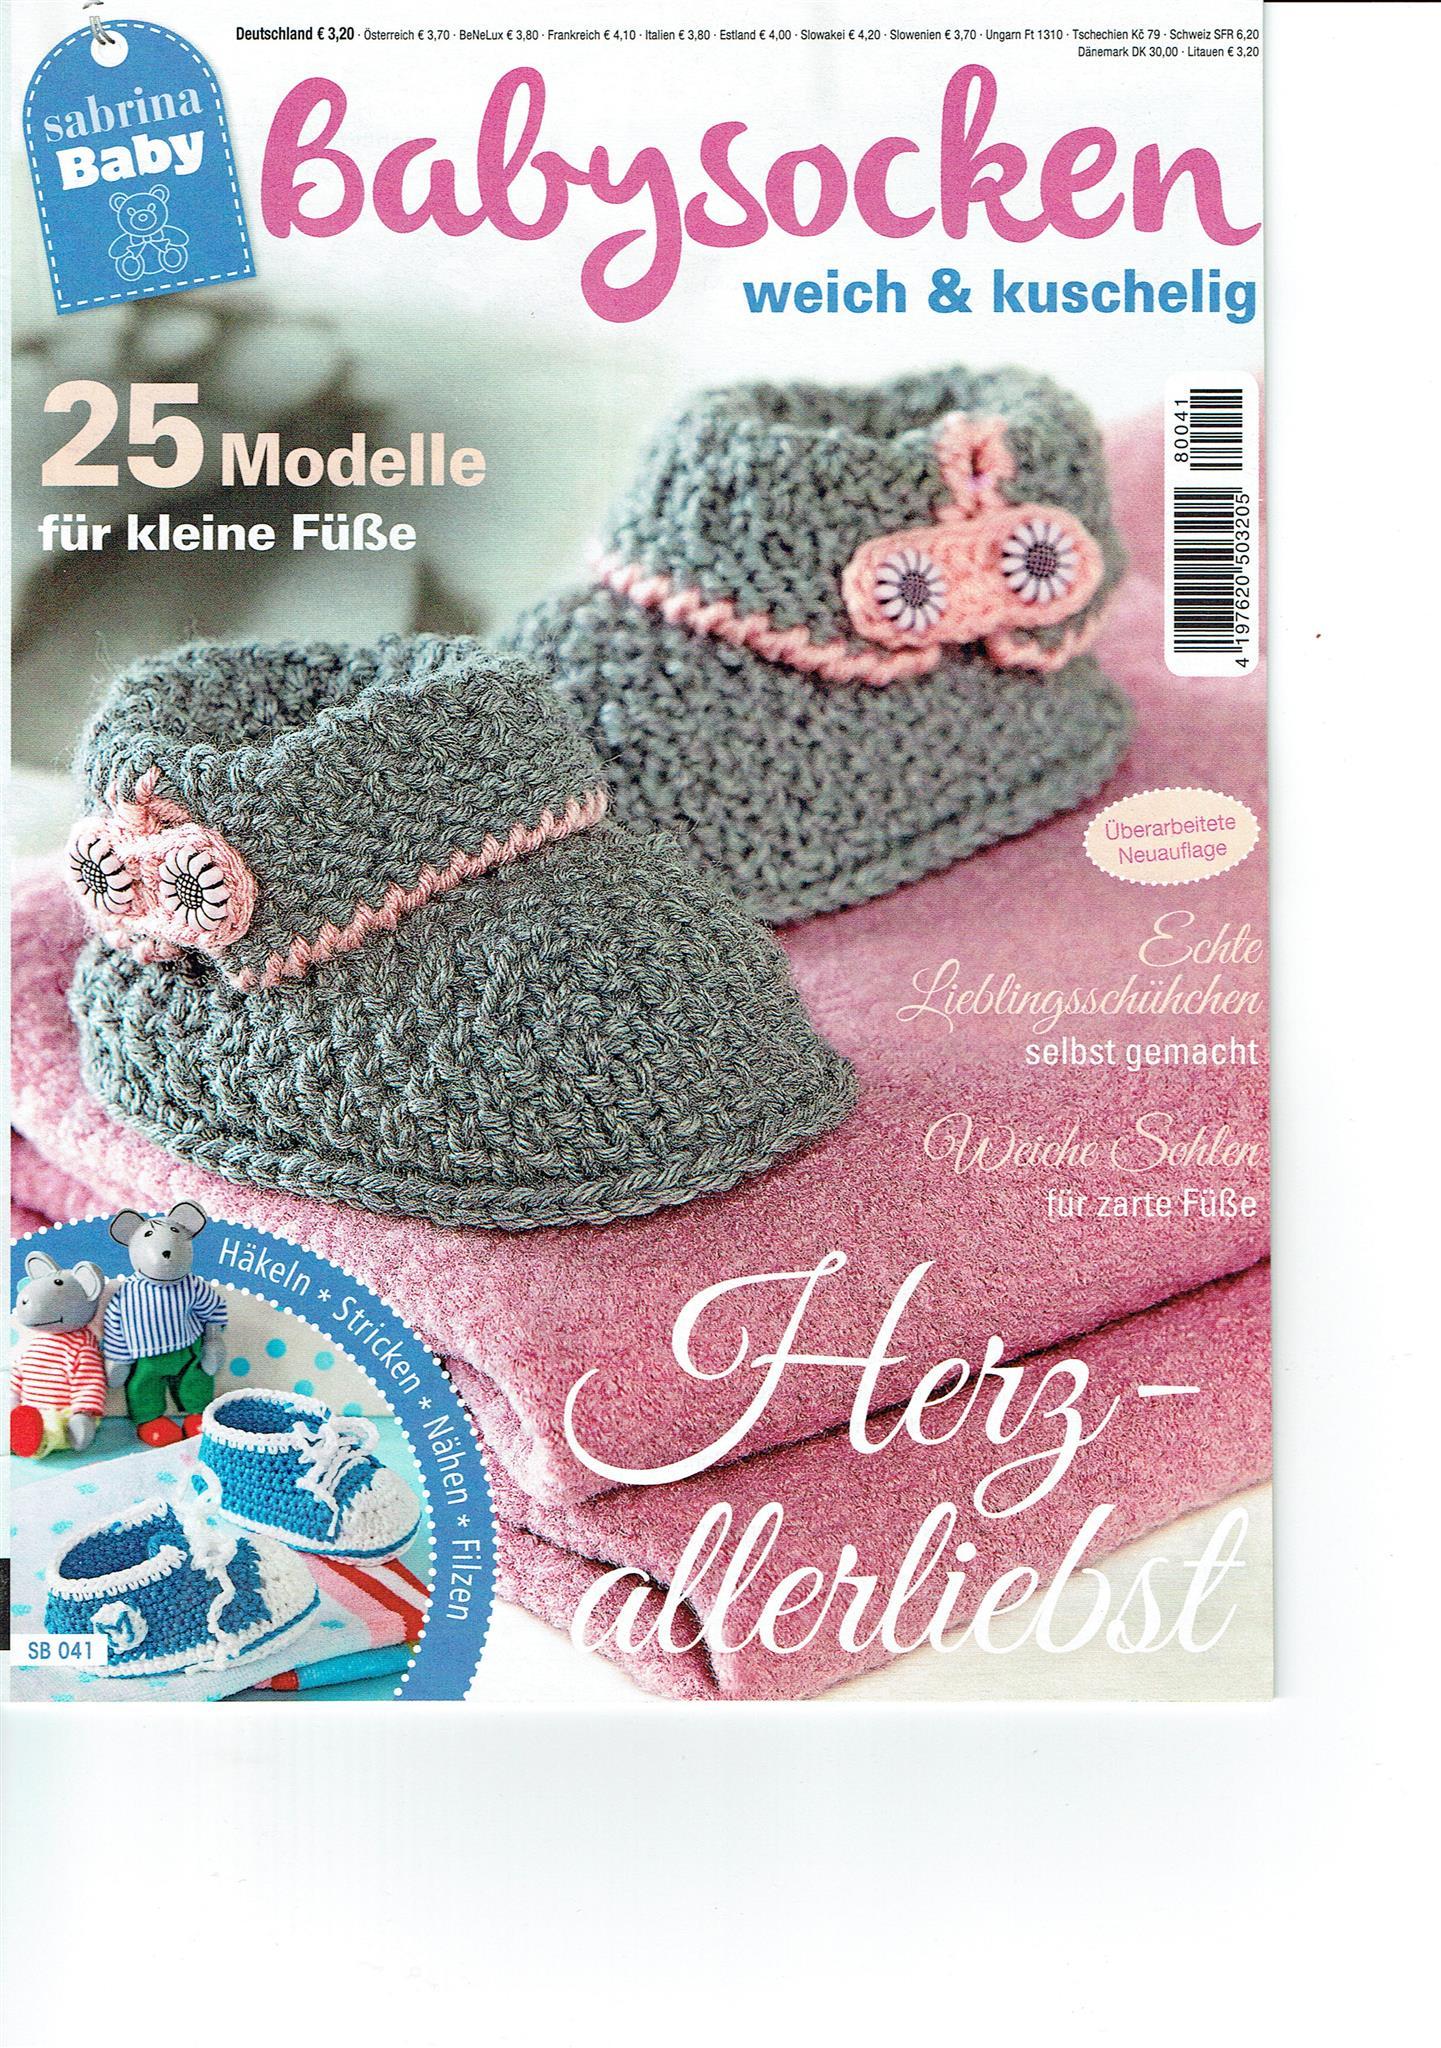 Sabrina Baby Babysocken Sb 041 Martinas Bastel Hobbykiste